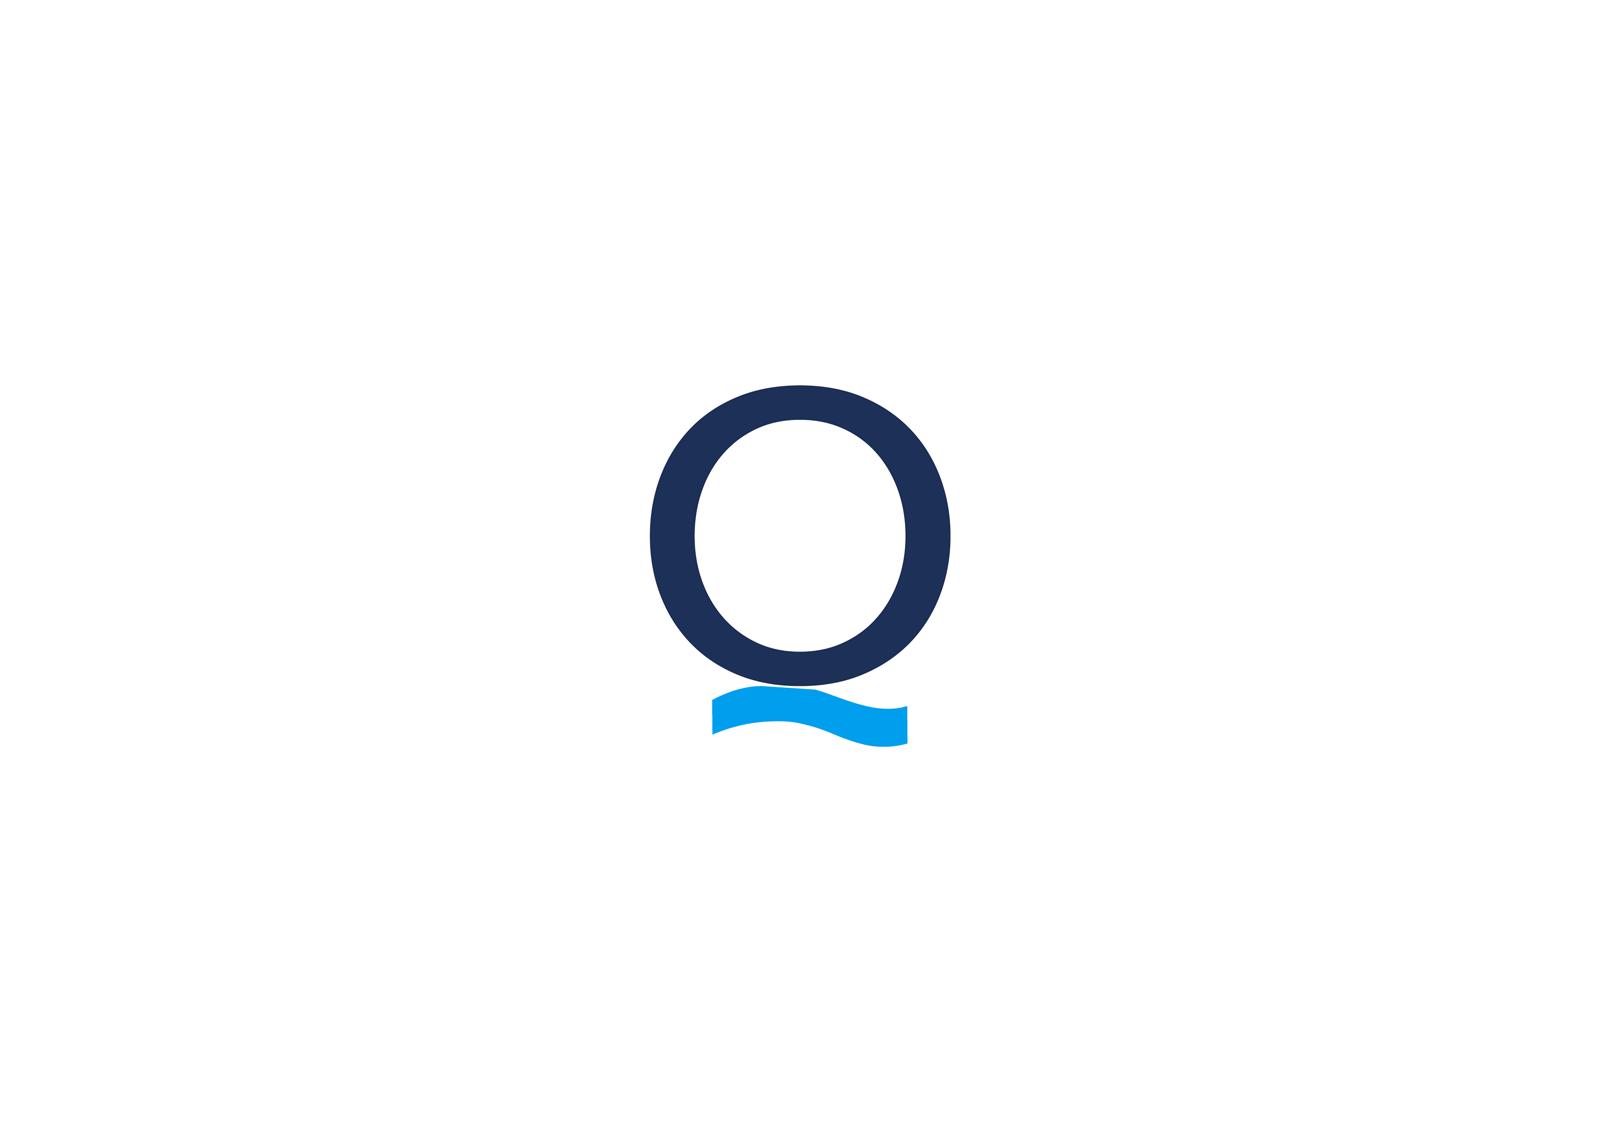 Monogram Design For Quayside Apartment